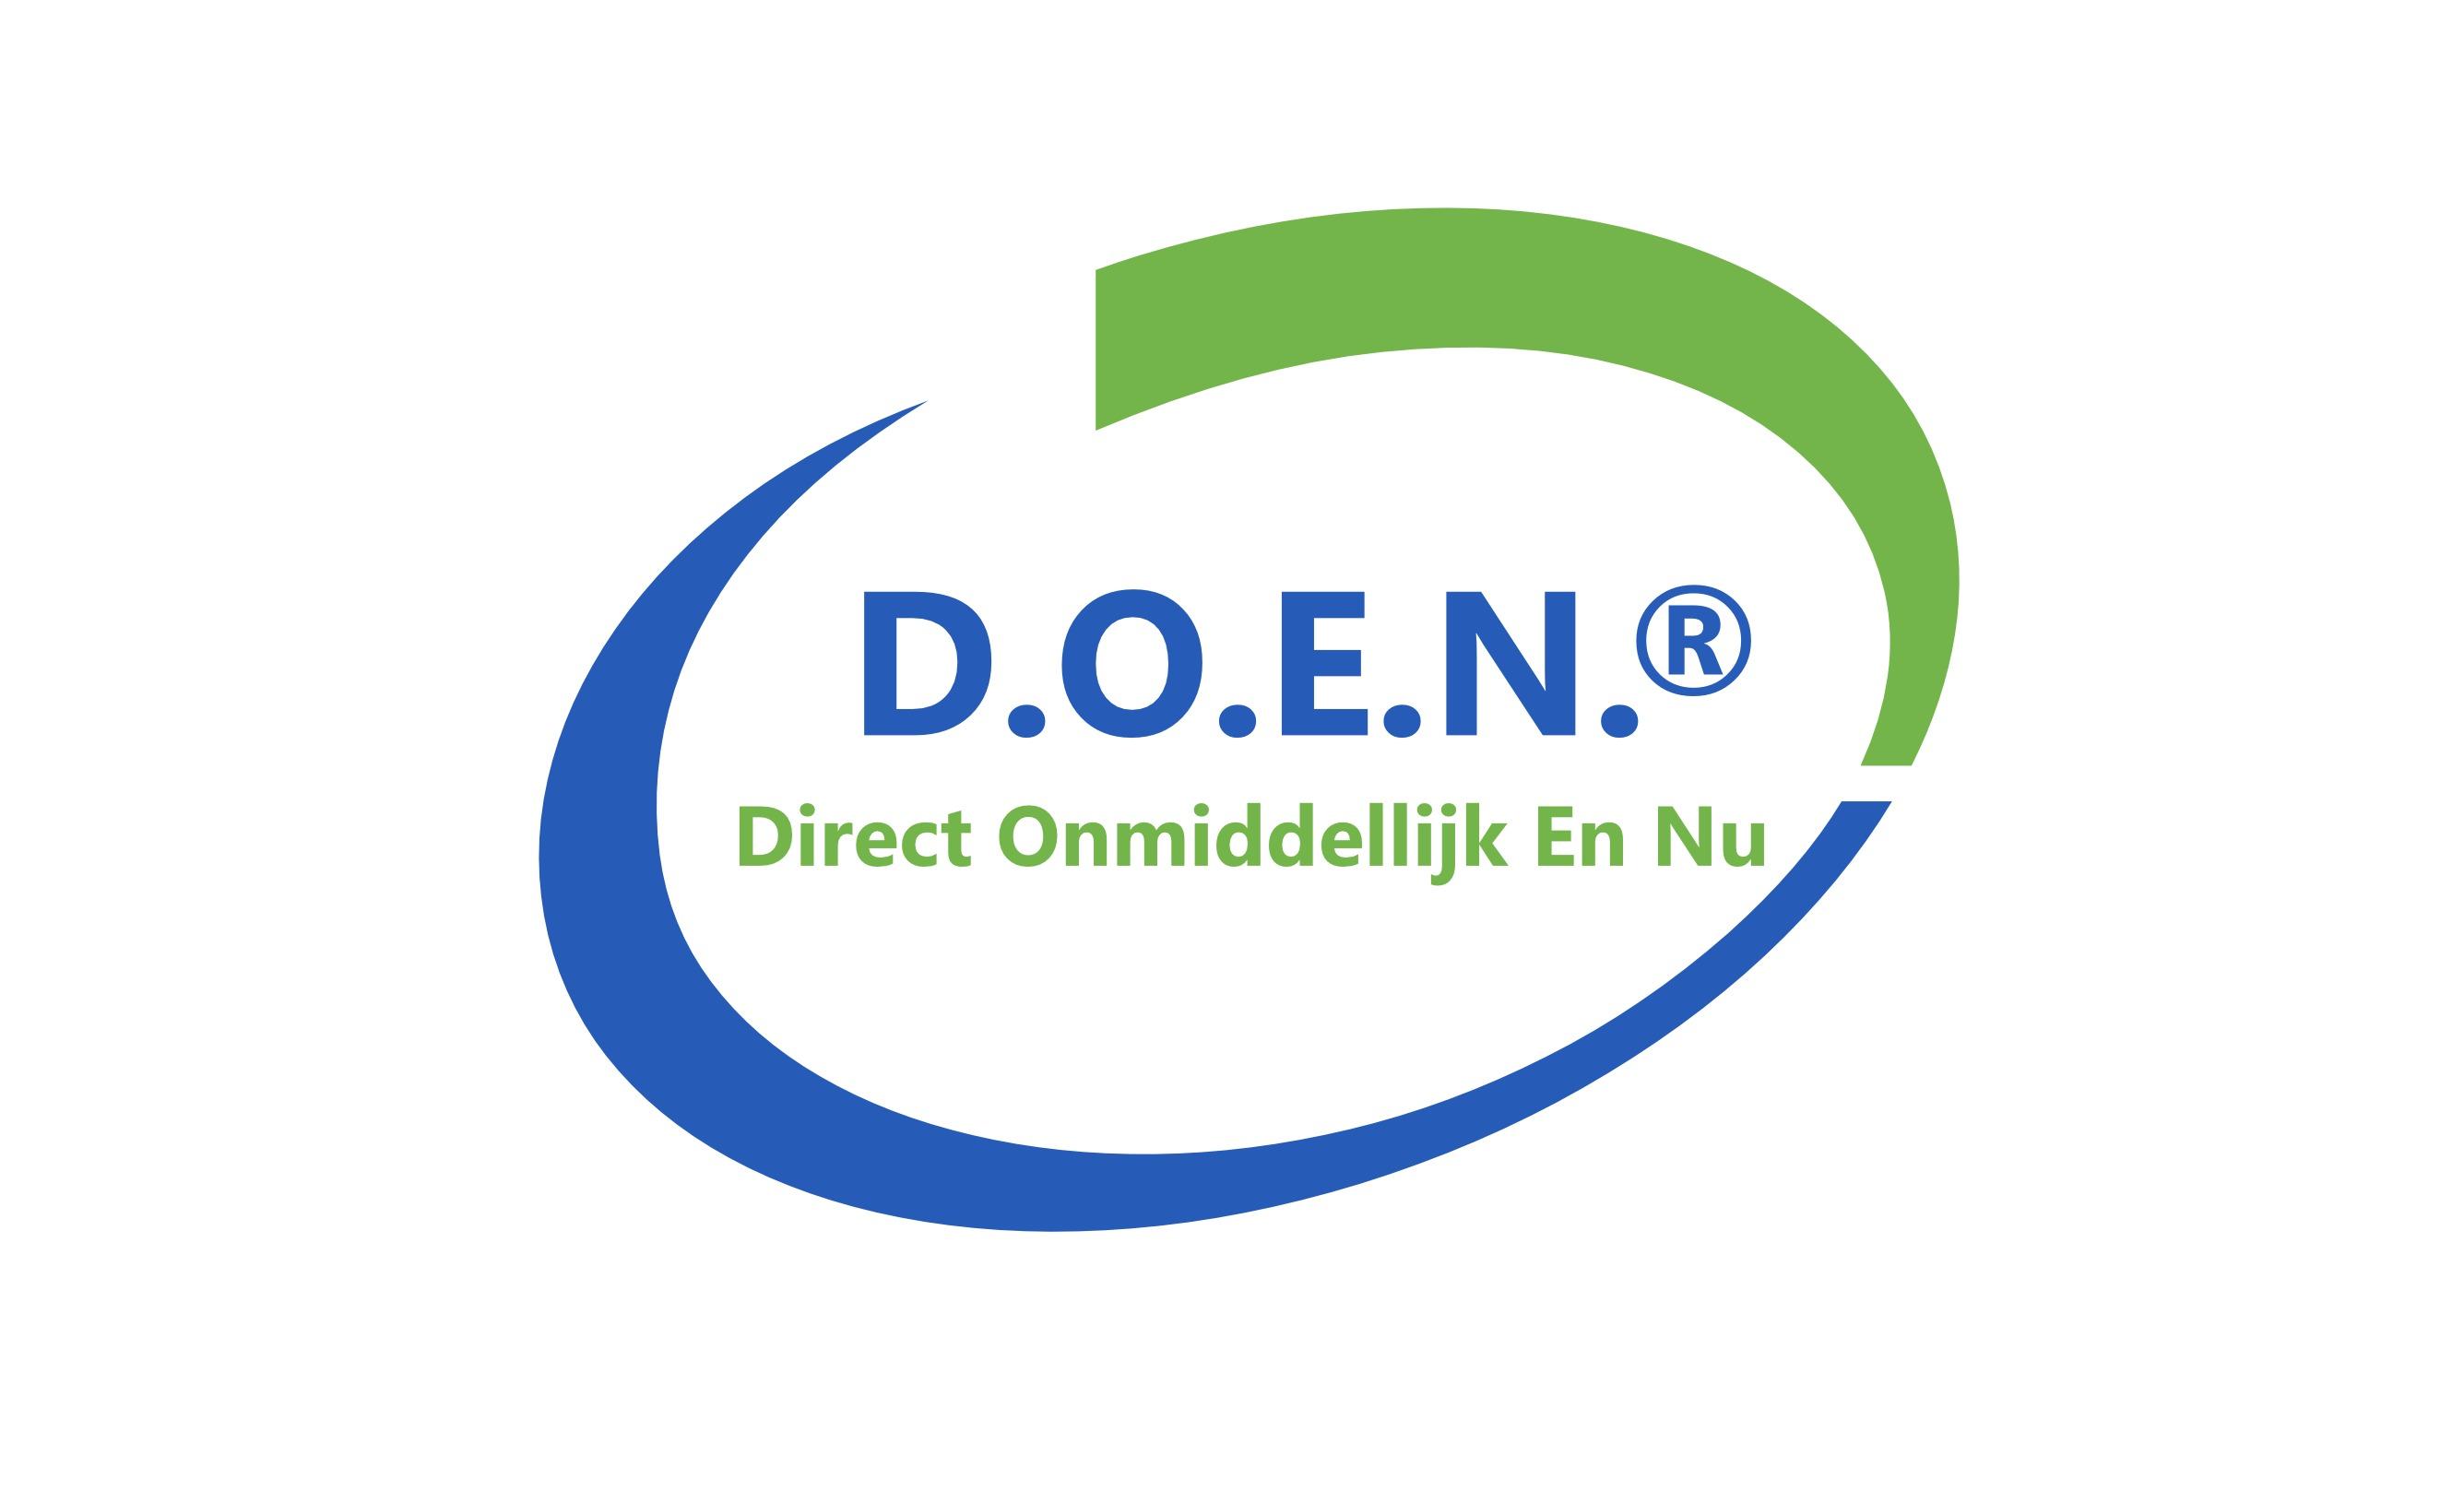 Logo van D.O.E.N.®